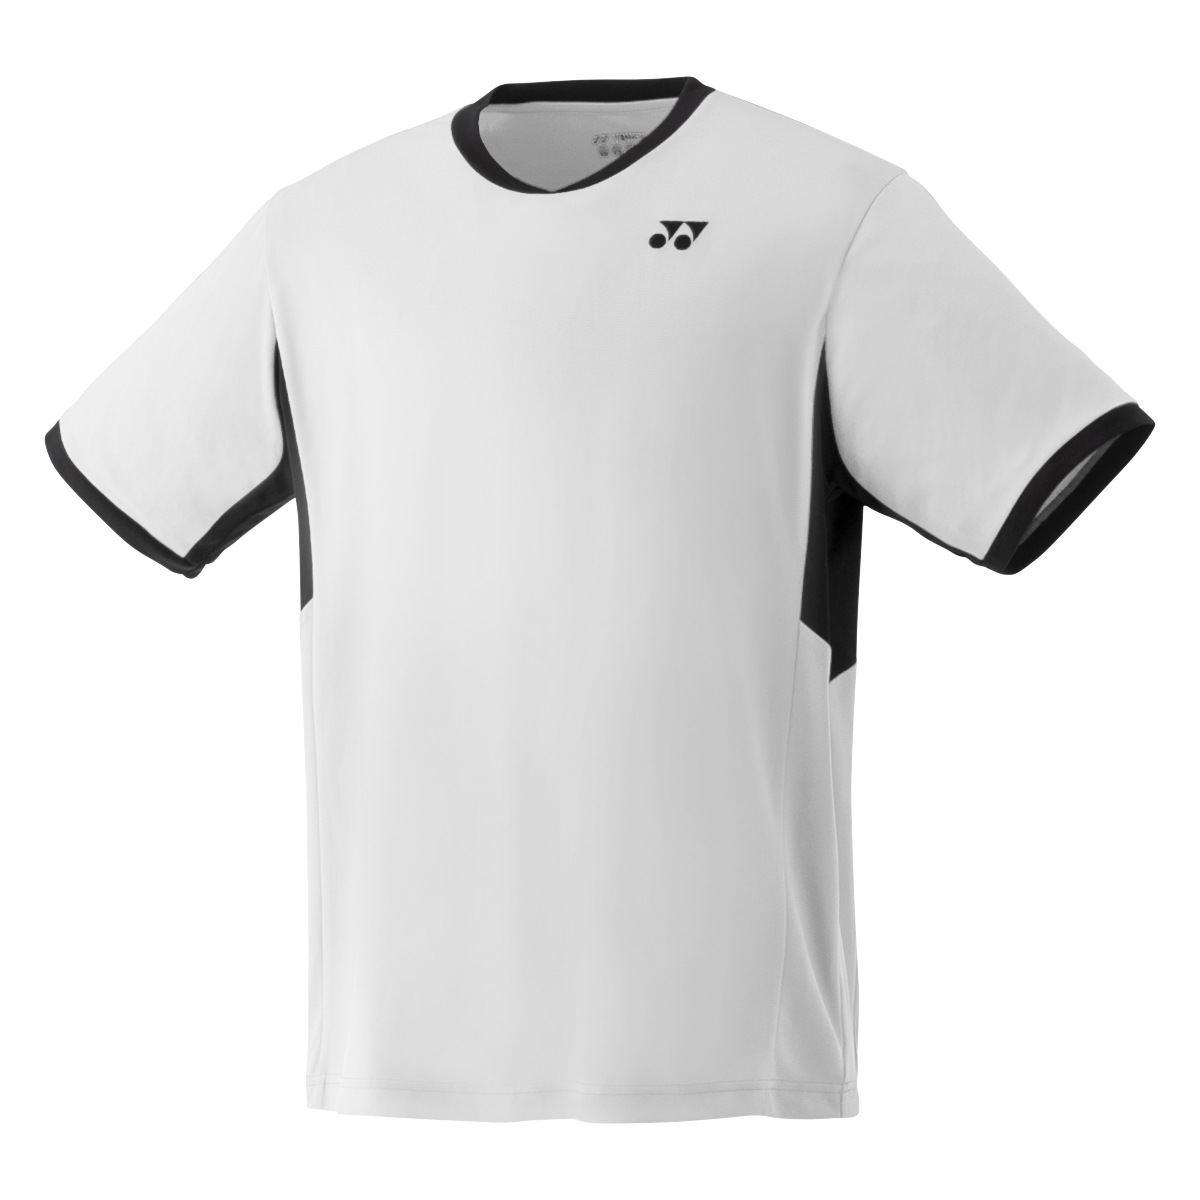 YONEX - Junior Crew Neck Shirt #YJ0010Detailbild - 3